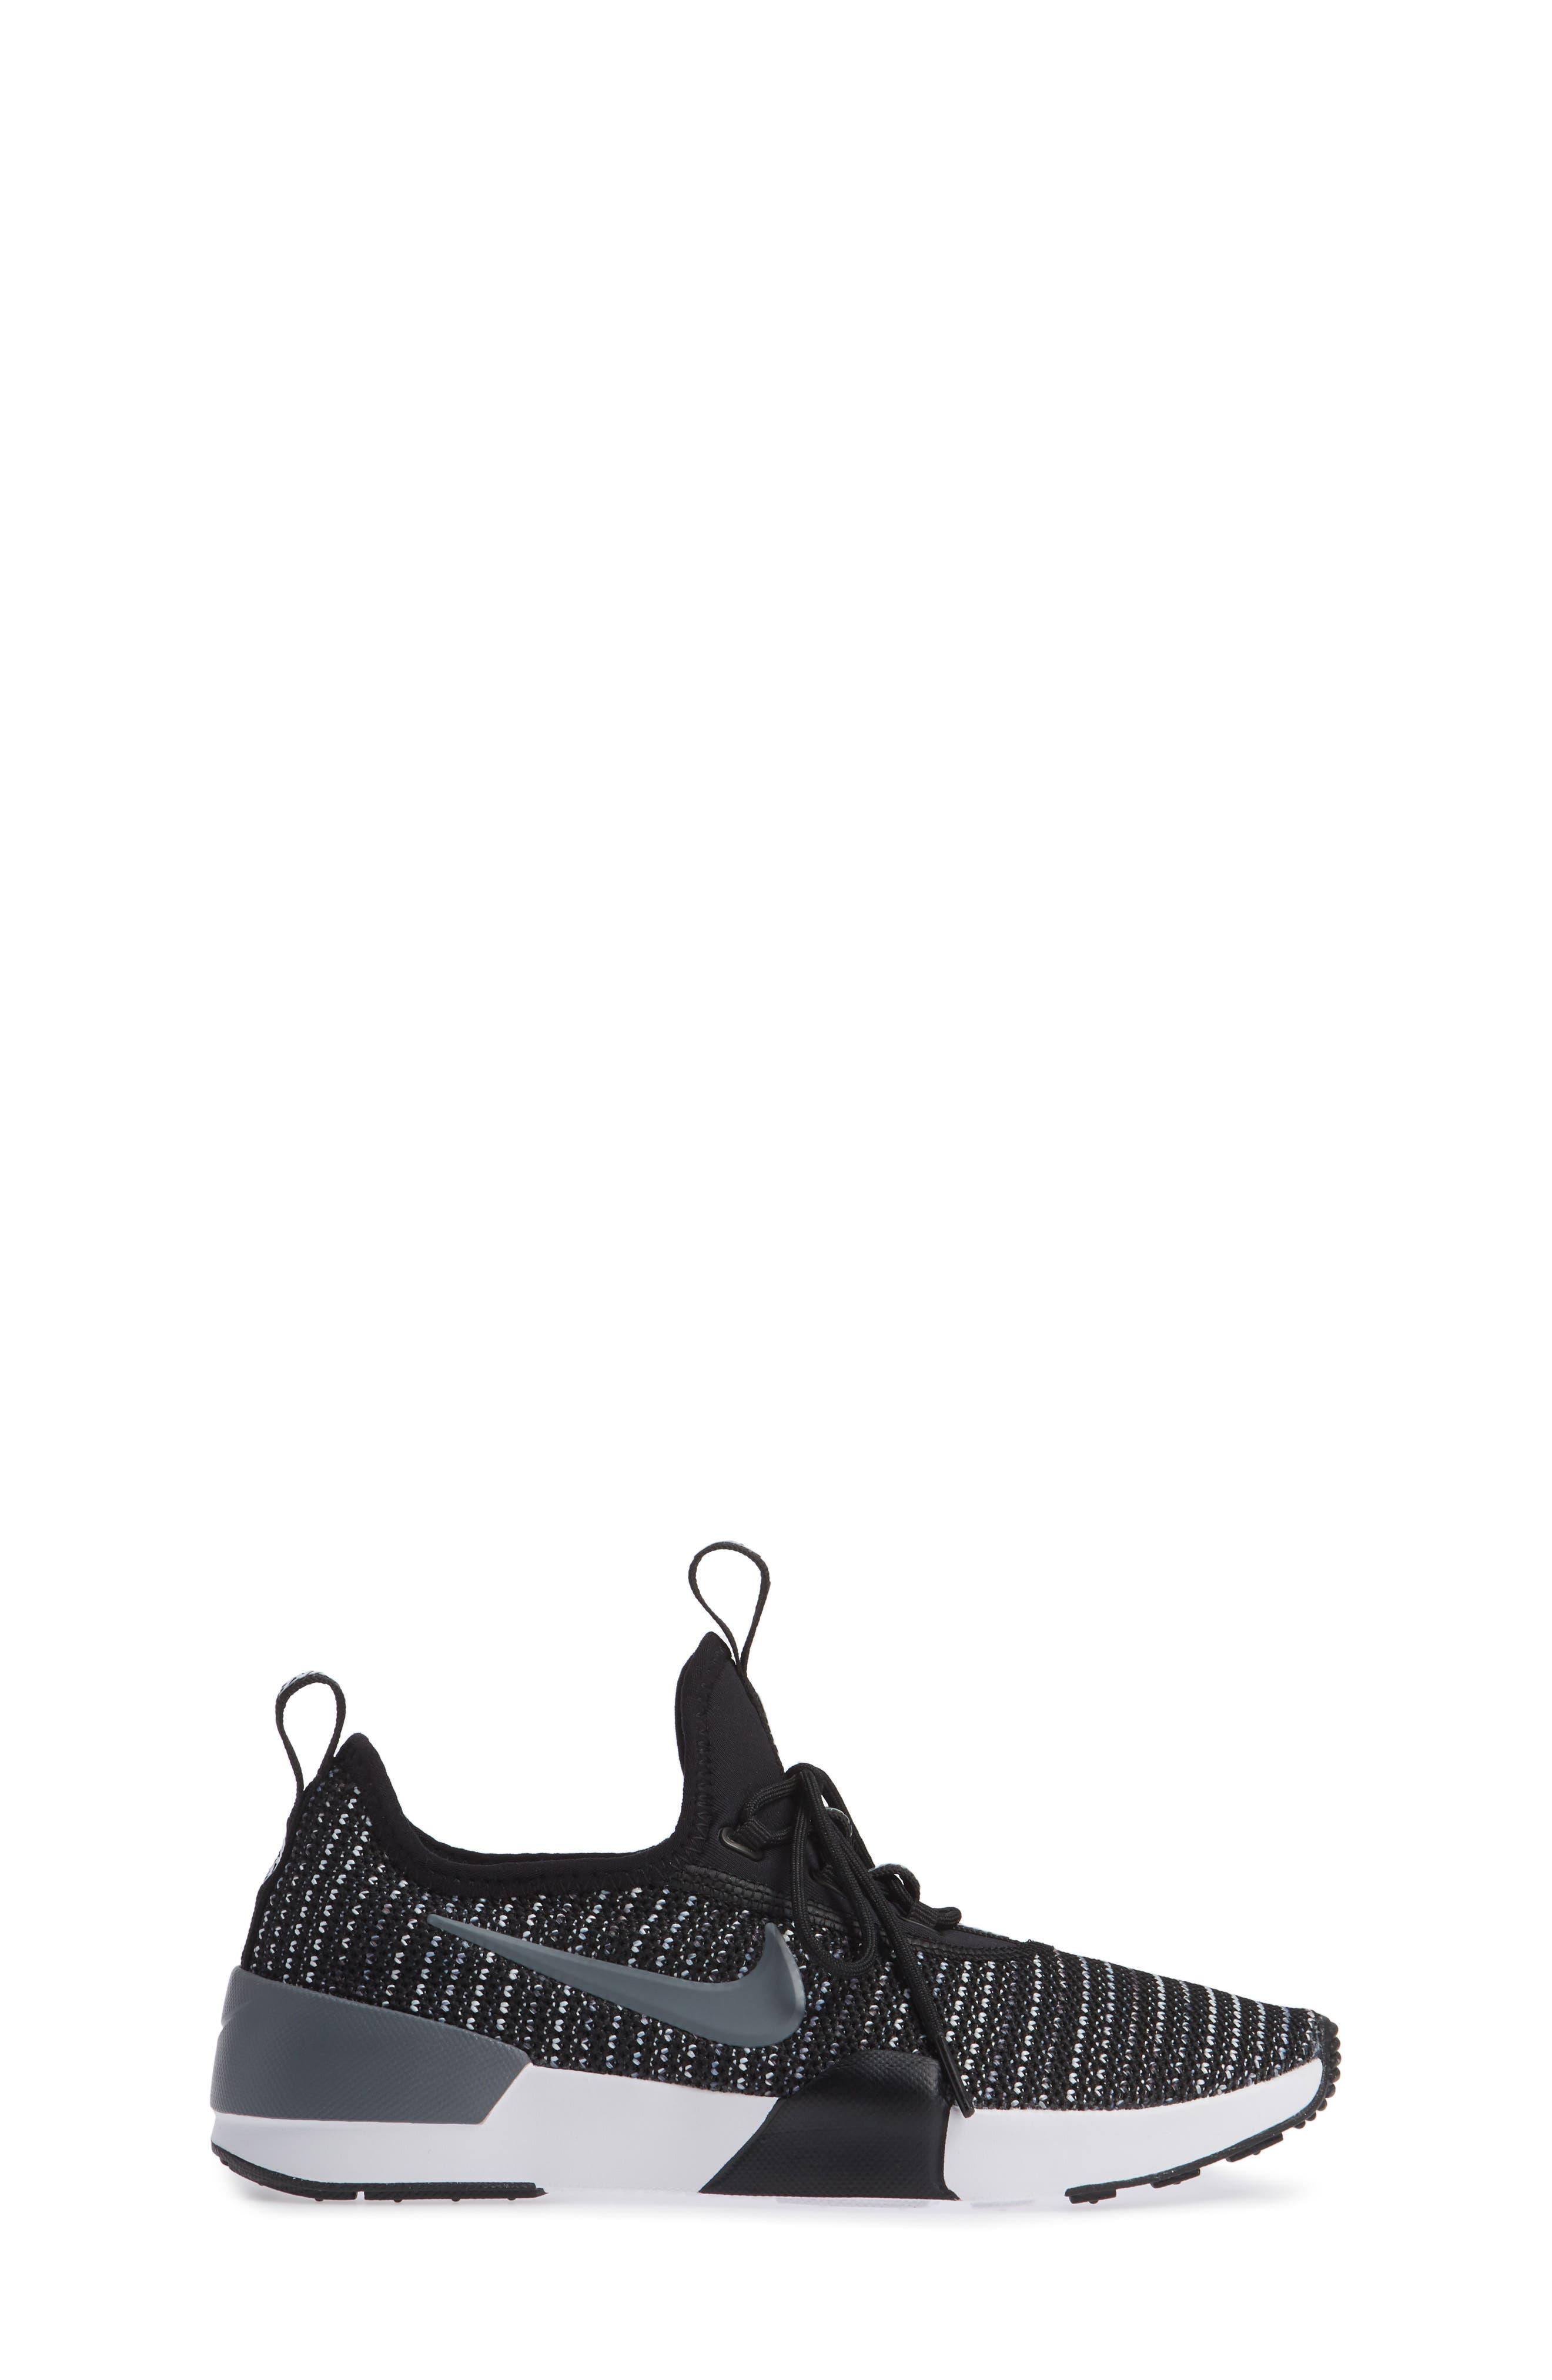 Ashin Modern Sock Knit Sneaker,                             Alternate thumbnail 4, color,                             Black/ Cool Grey/ Anthracite